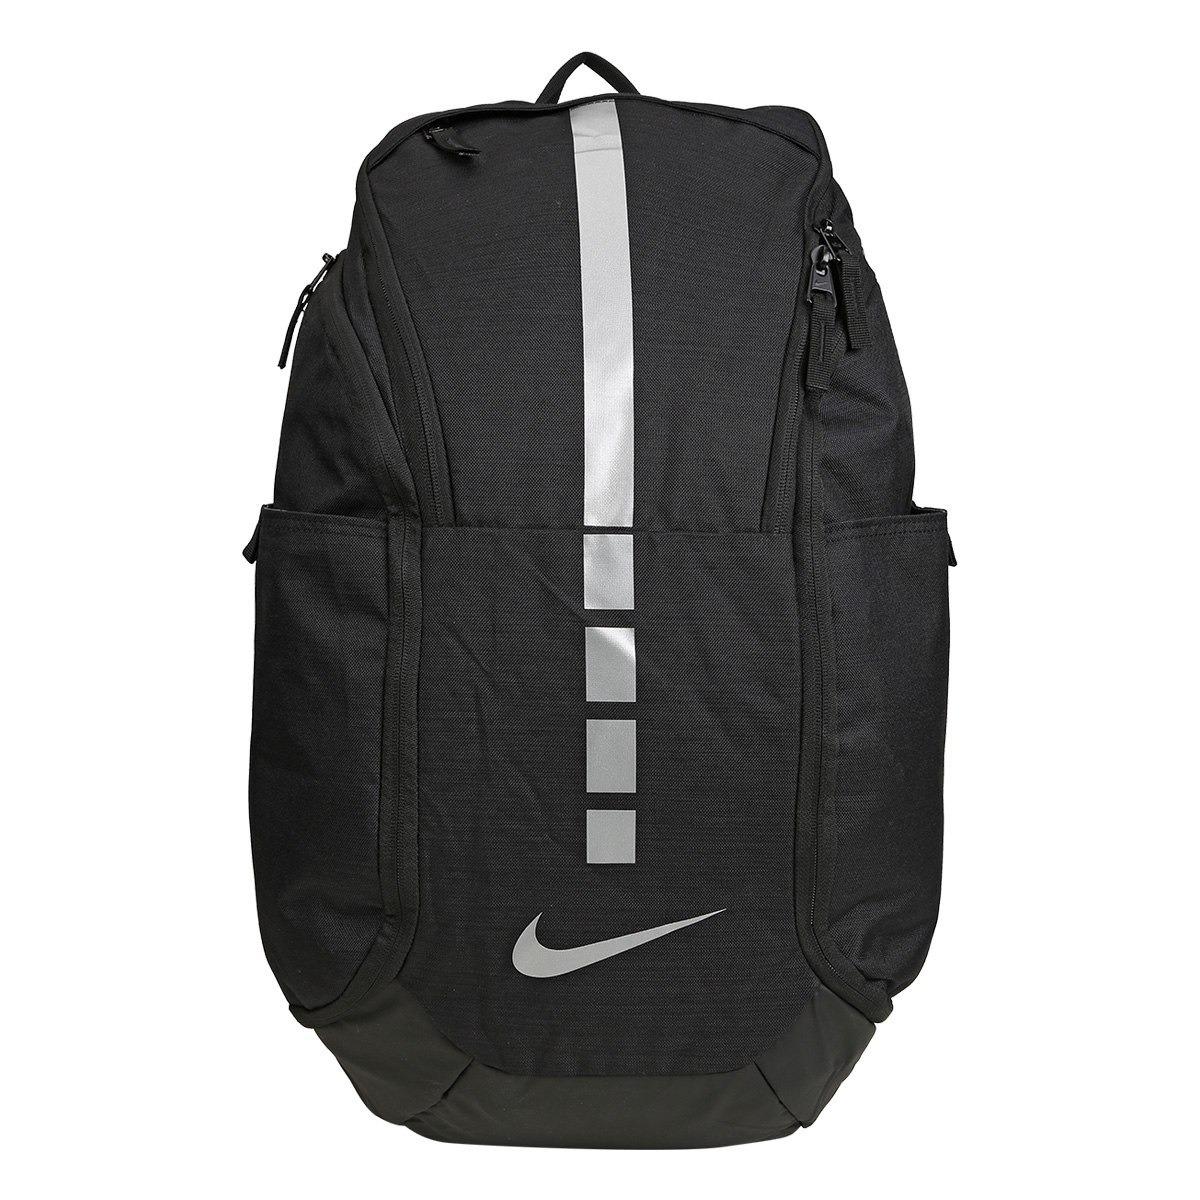 8f3ac440 Mochila Nike Hoops Elite Pro Preto - R$ 269,90 em Mercado Livre